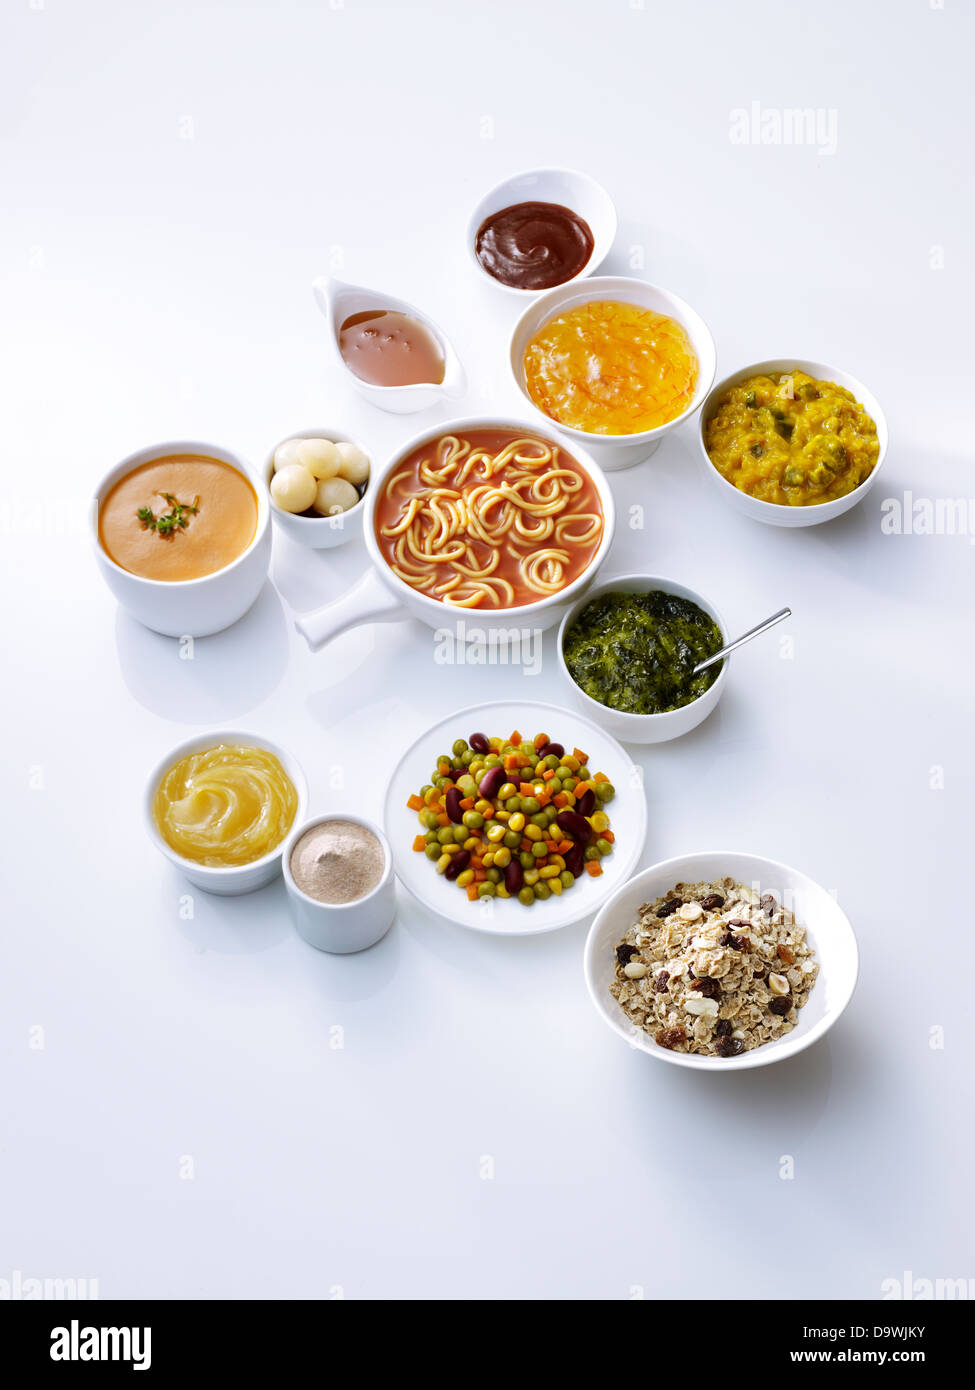 comfort food - Stock Image